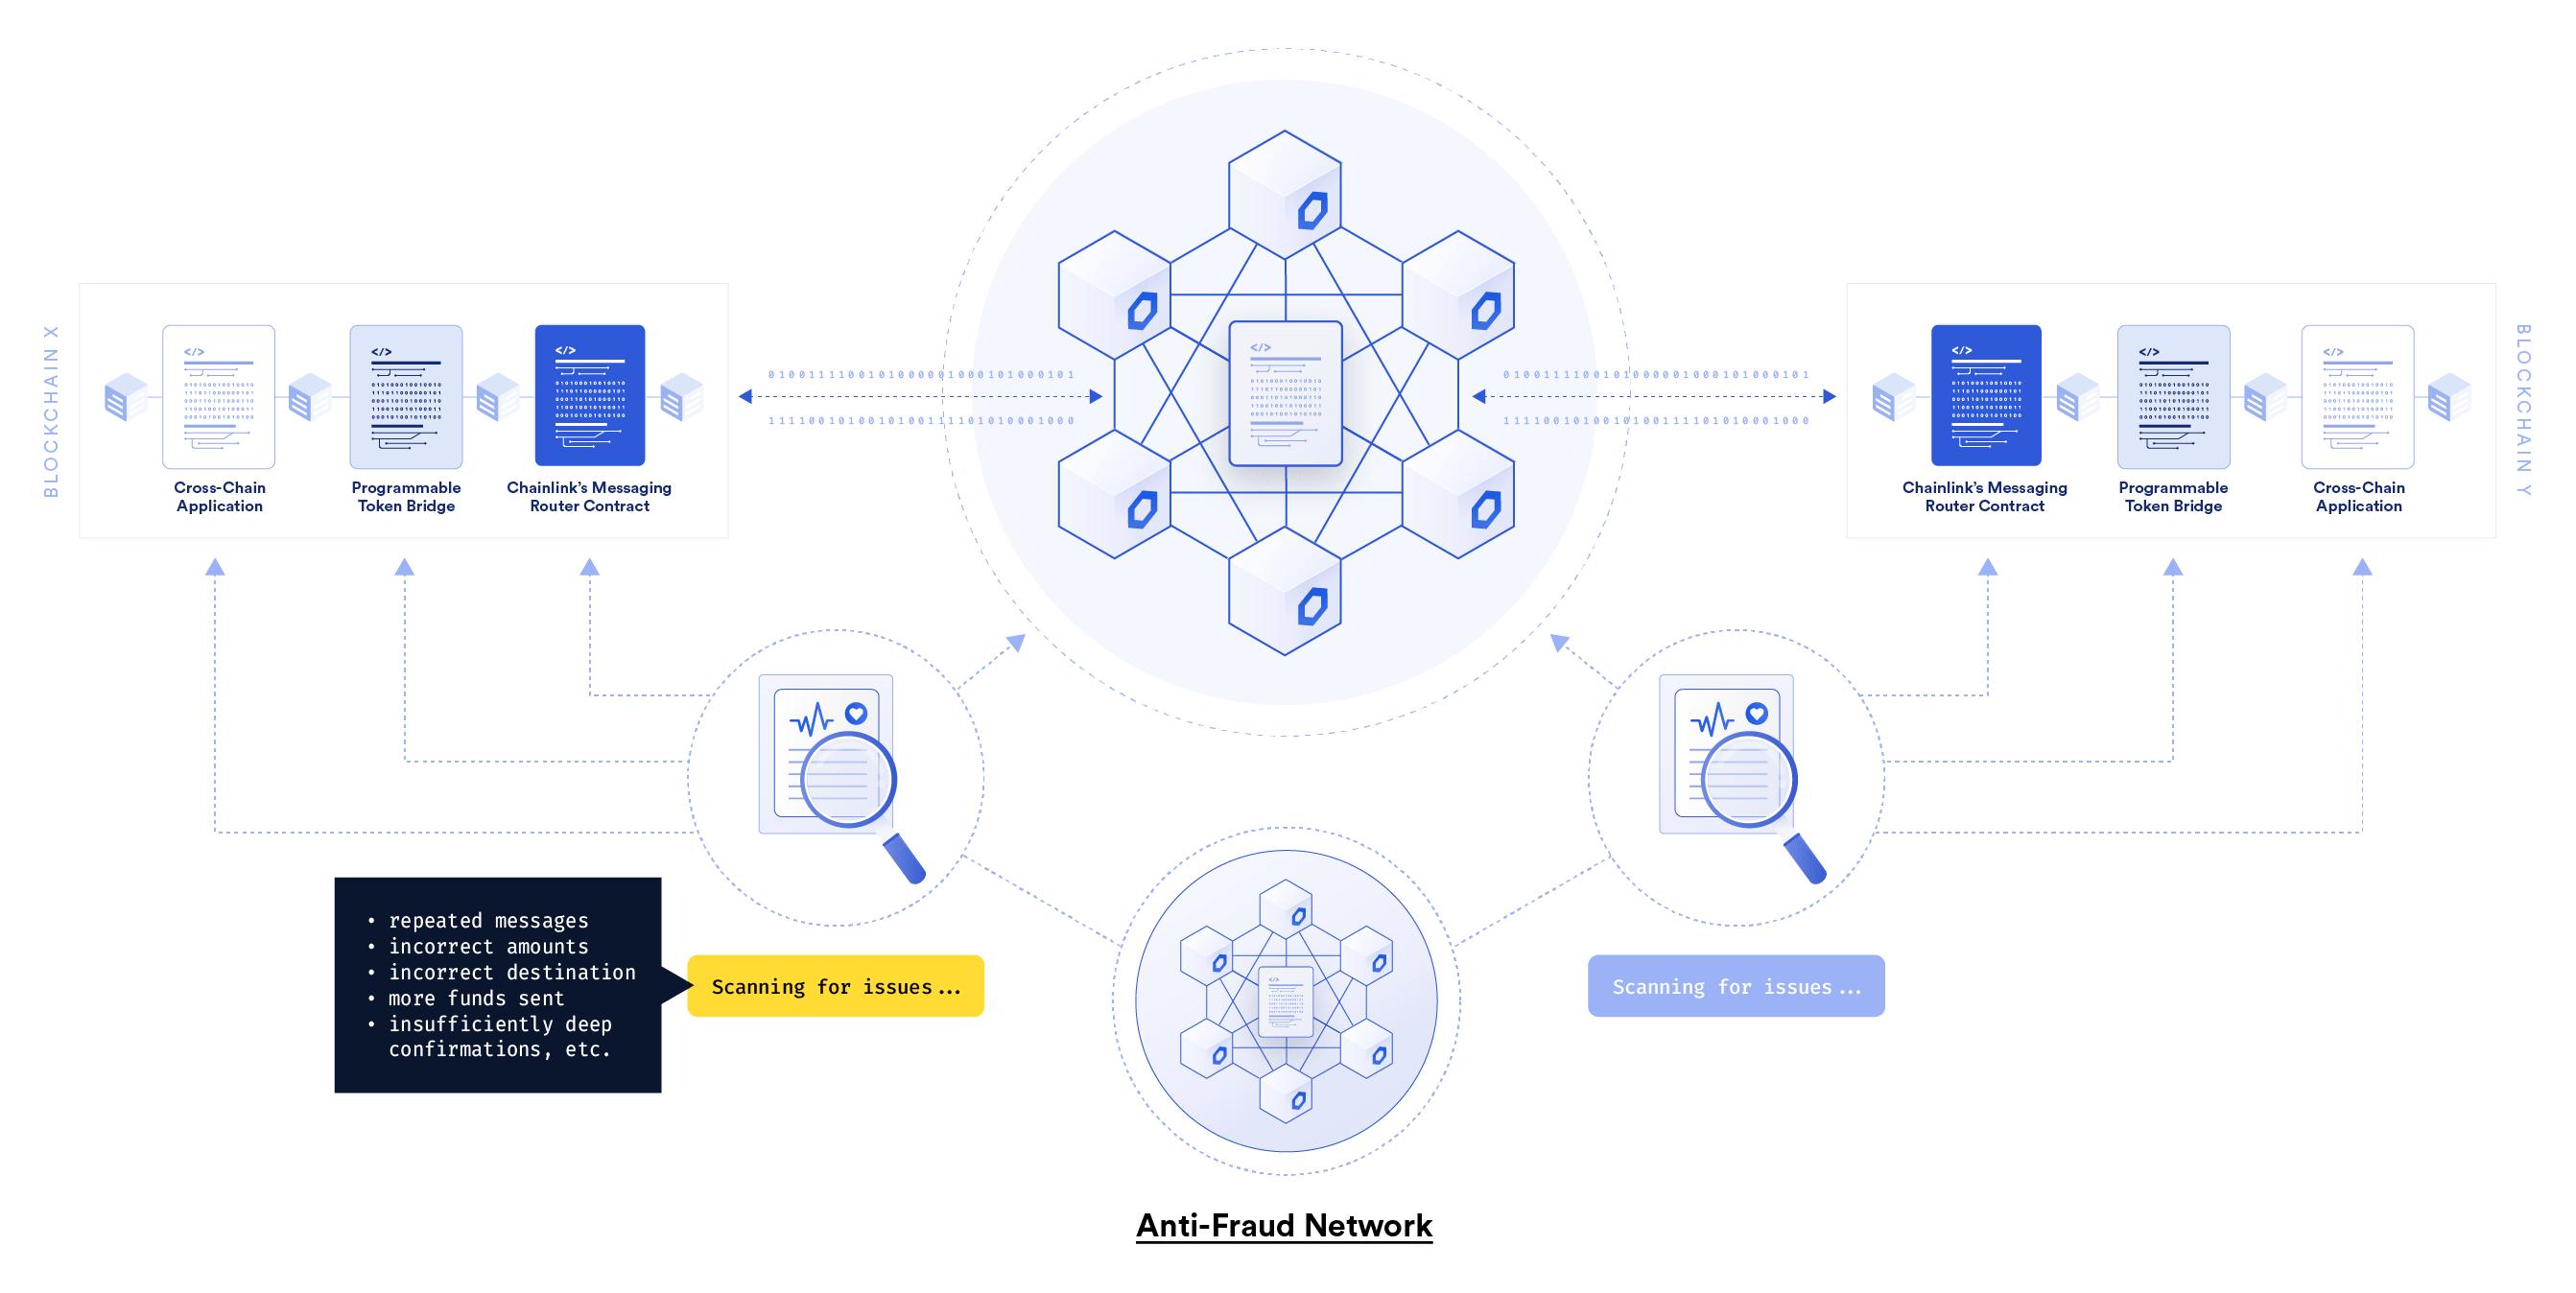 Chainlink Anti-Fraud Network